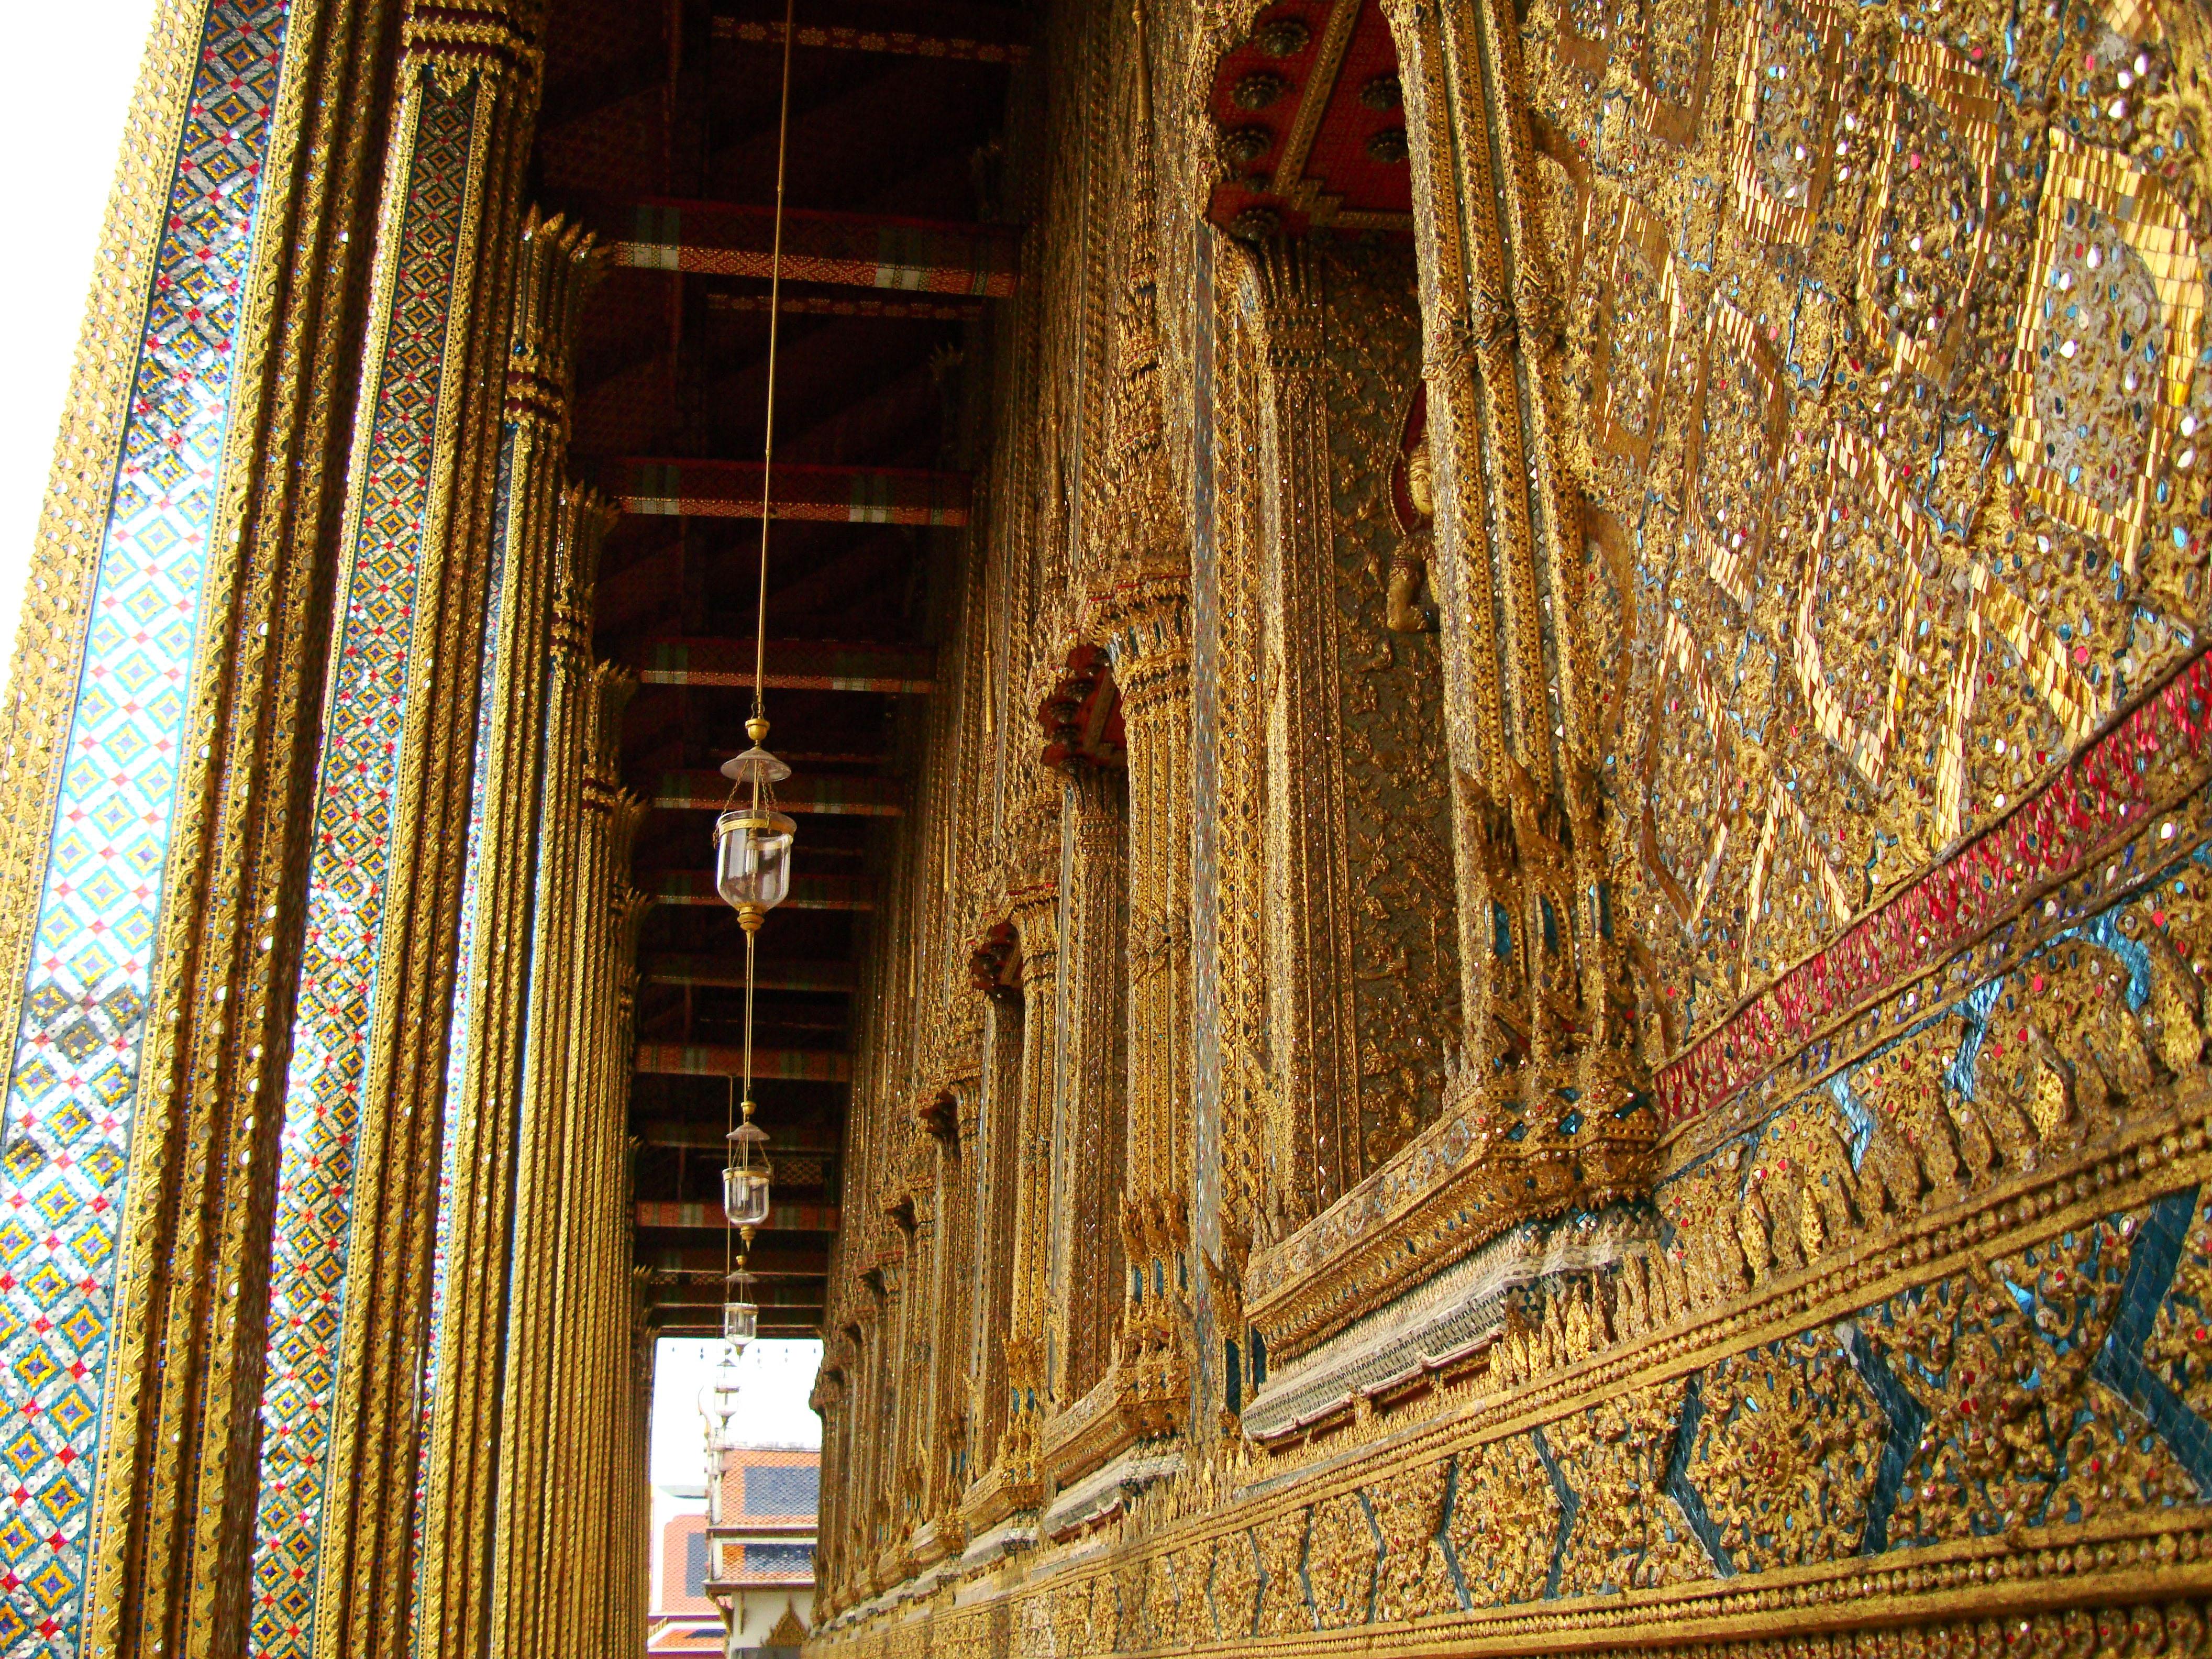 10 Temple of the Emerald Buddha intercrit designed walls pillars Grand Palace 04